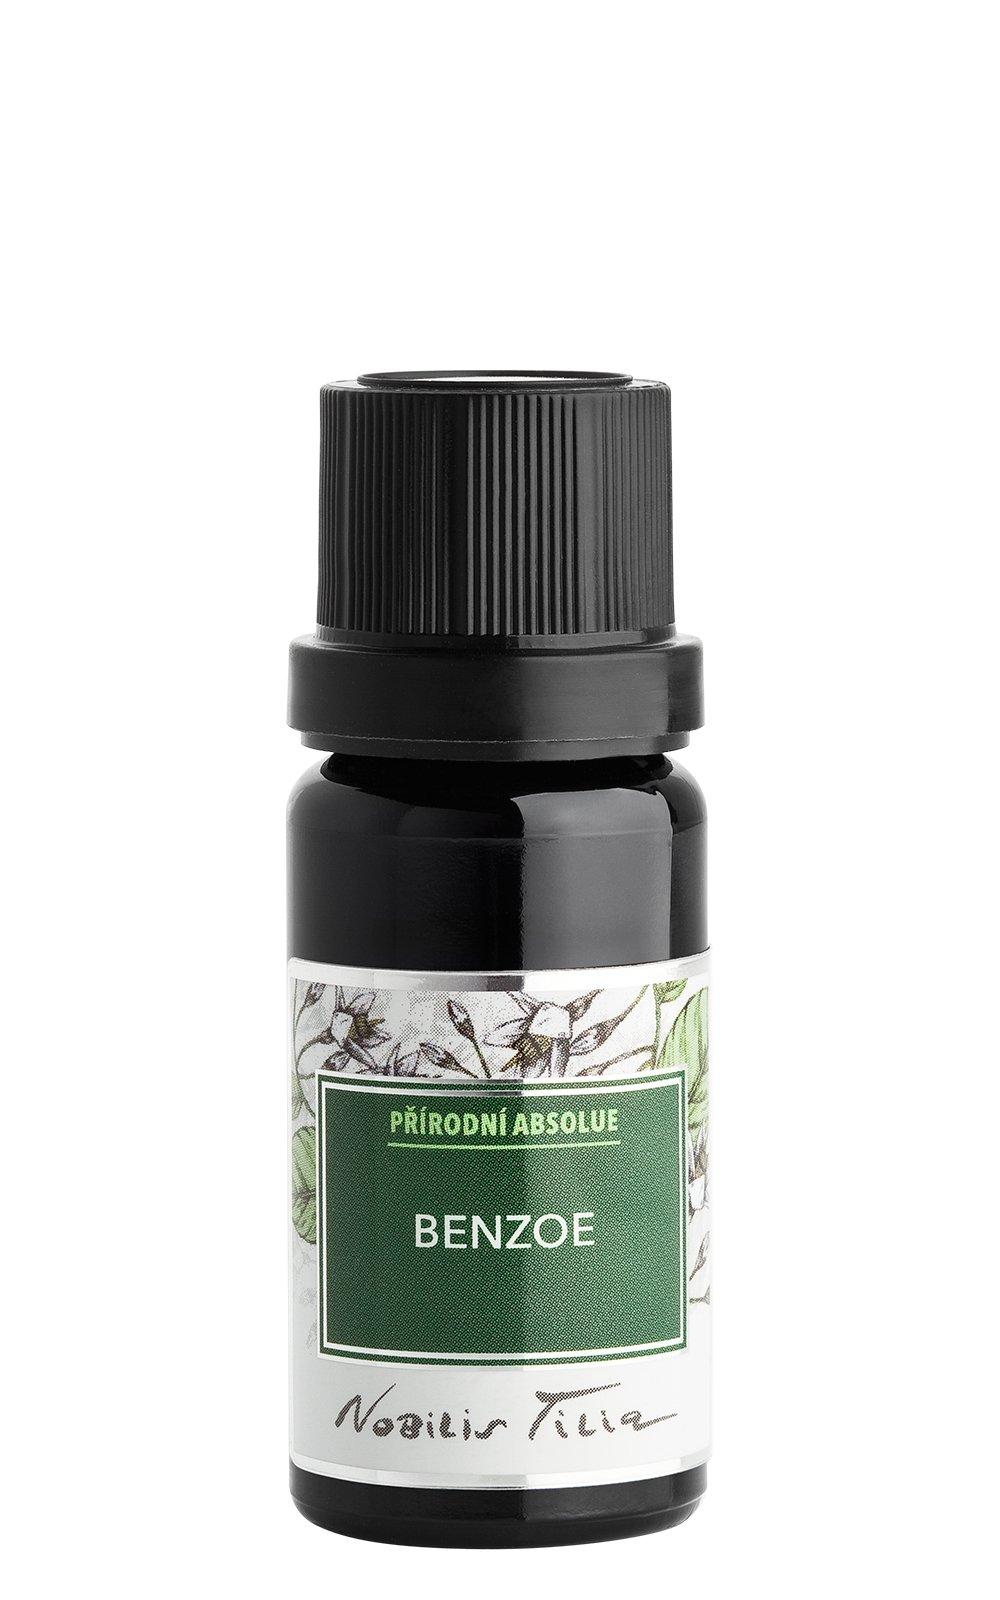 Benzoe absolue 50%: 10 ml